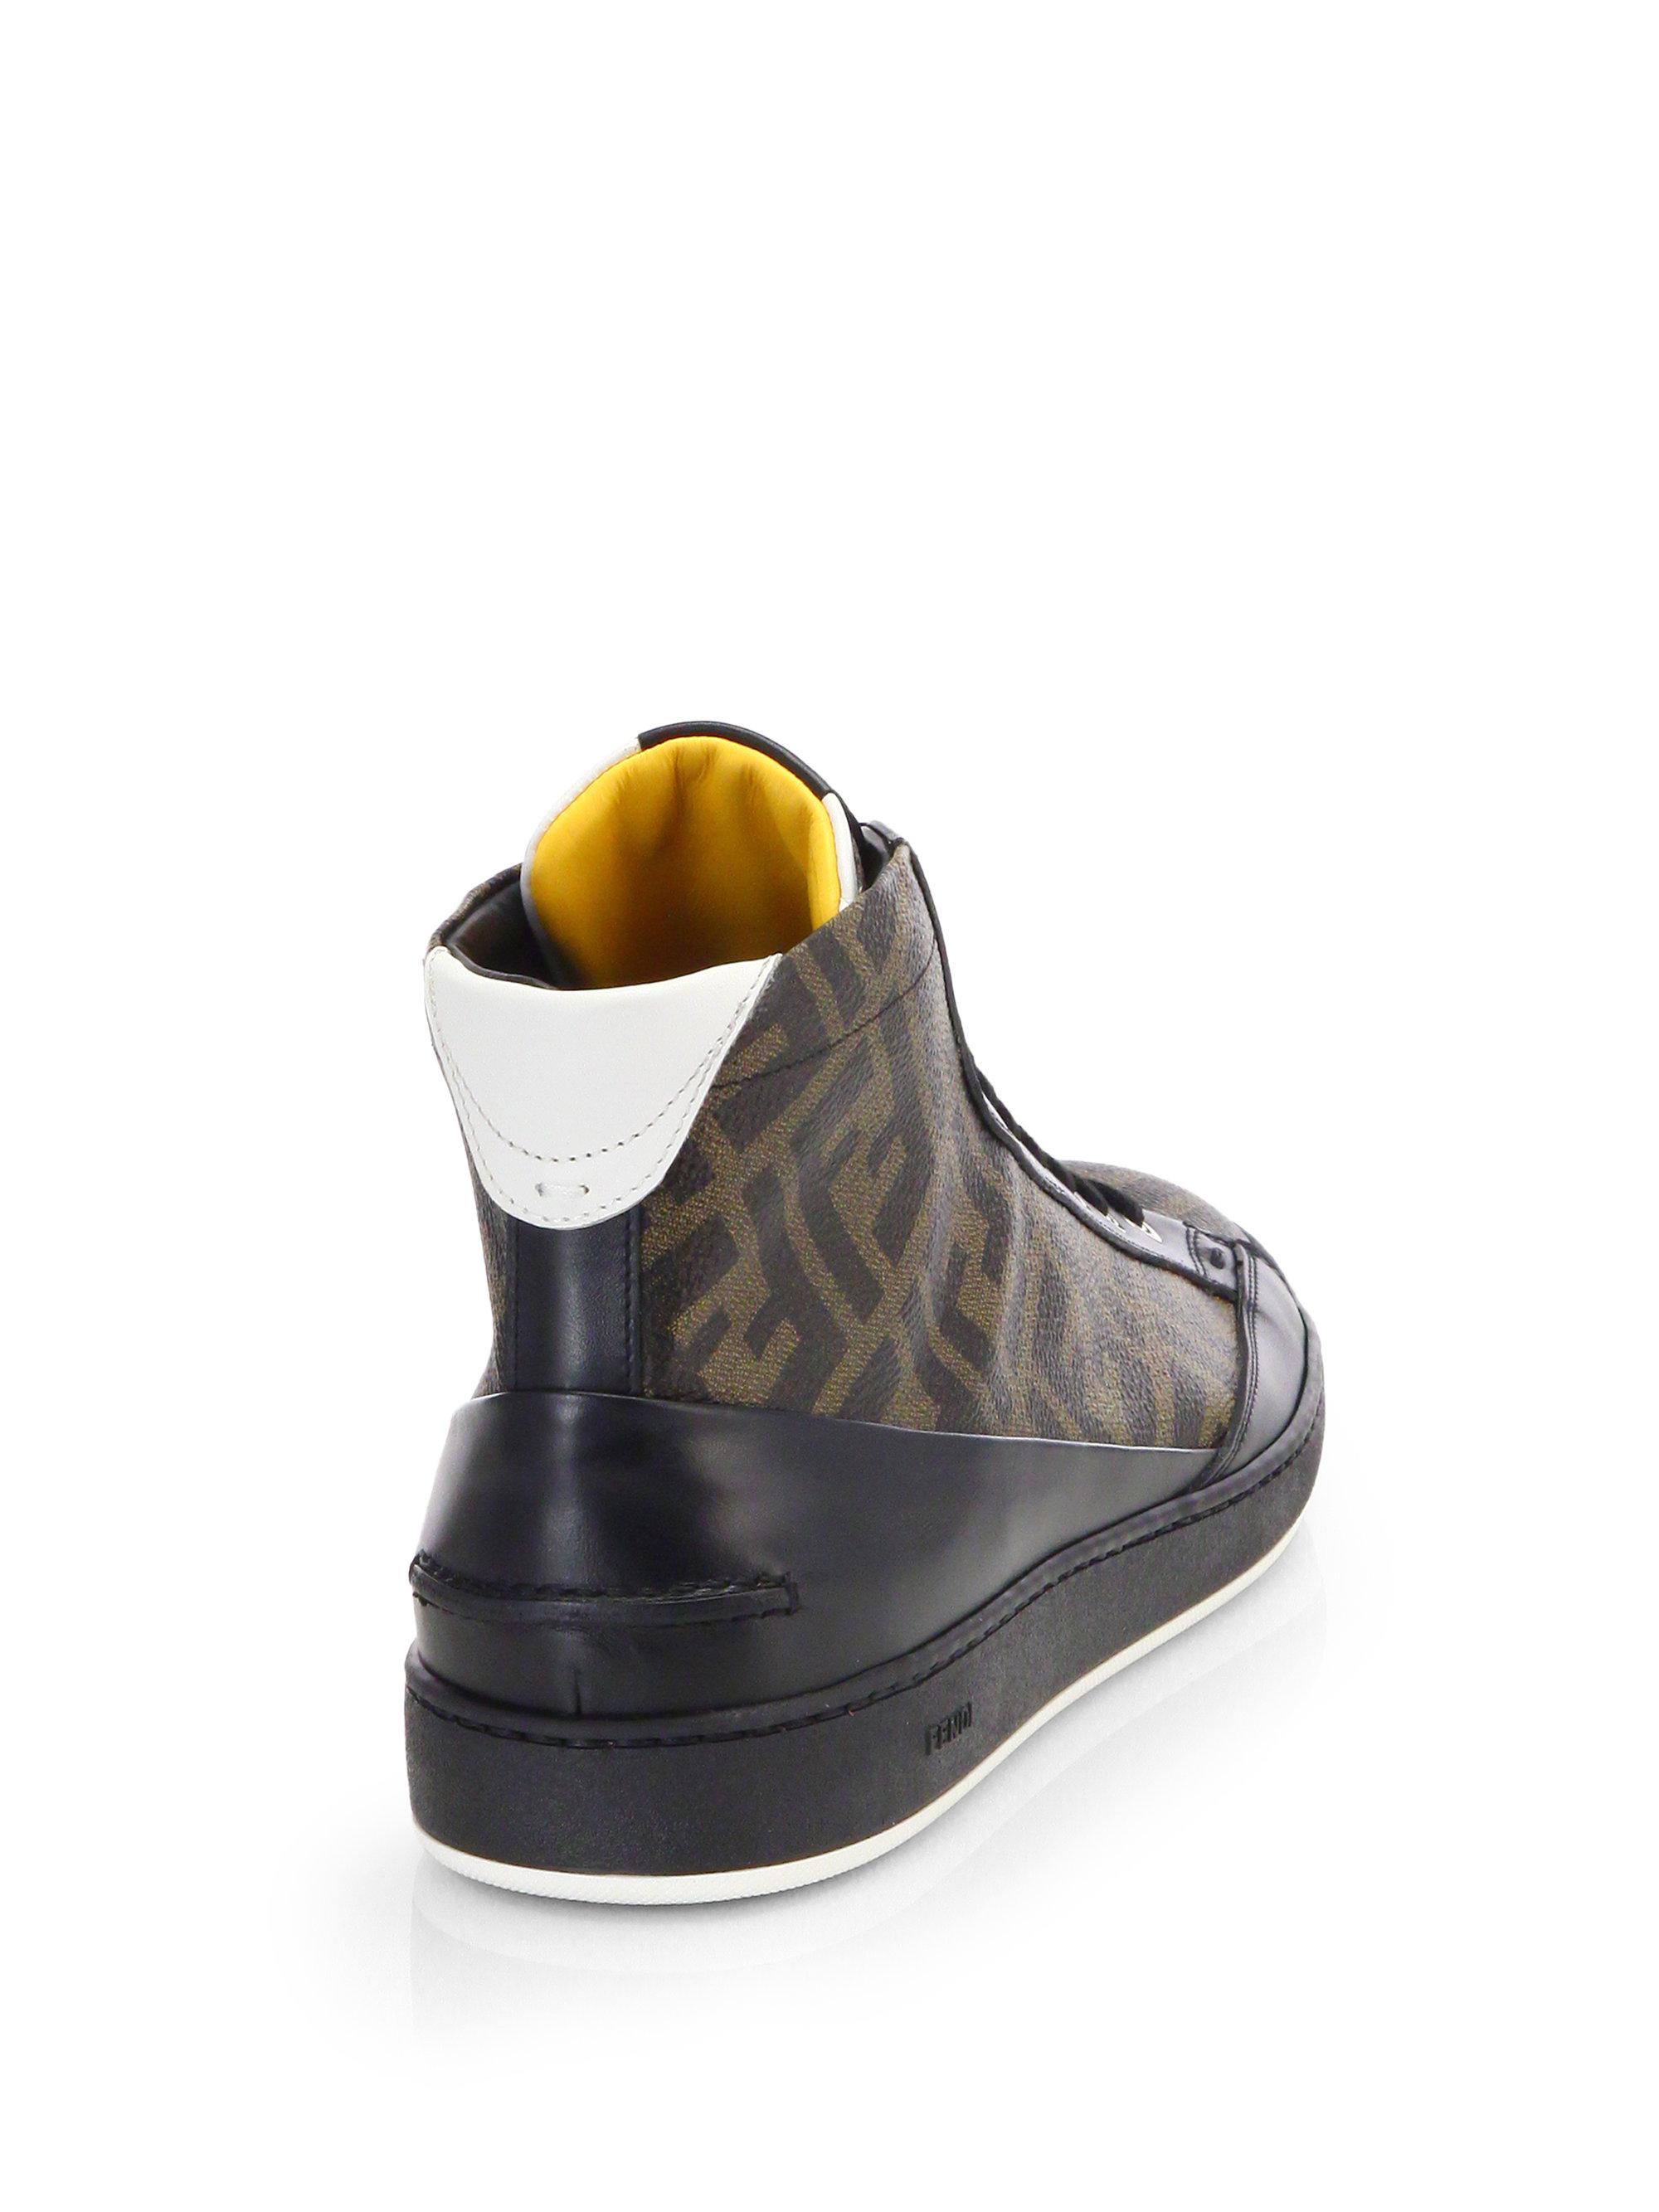 3ca732729e Fendi Brown Zucca Hightop Leather Sneaker for men